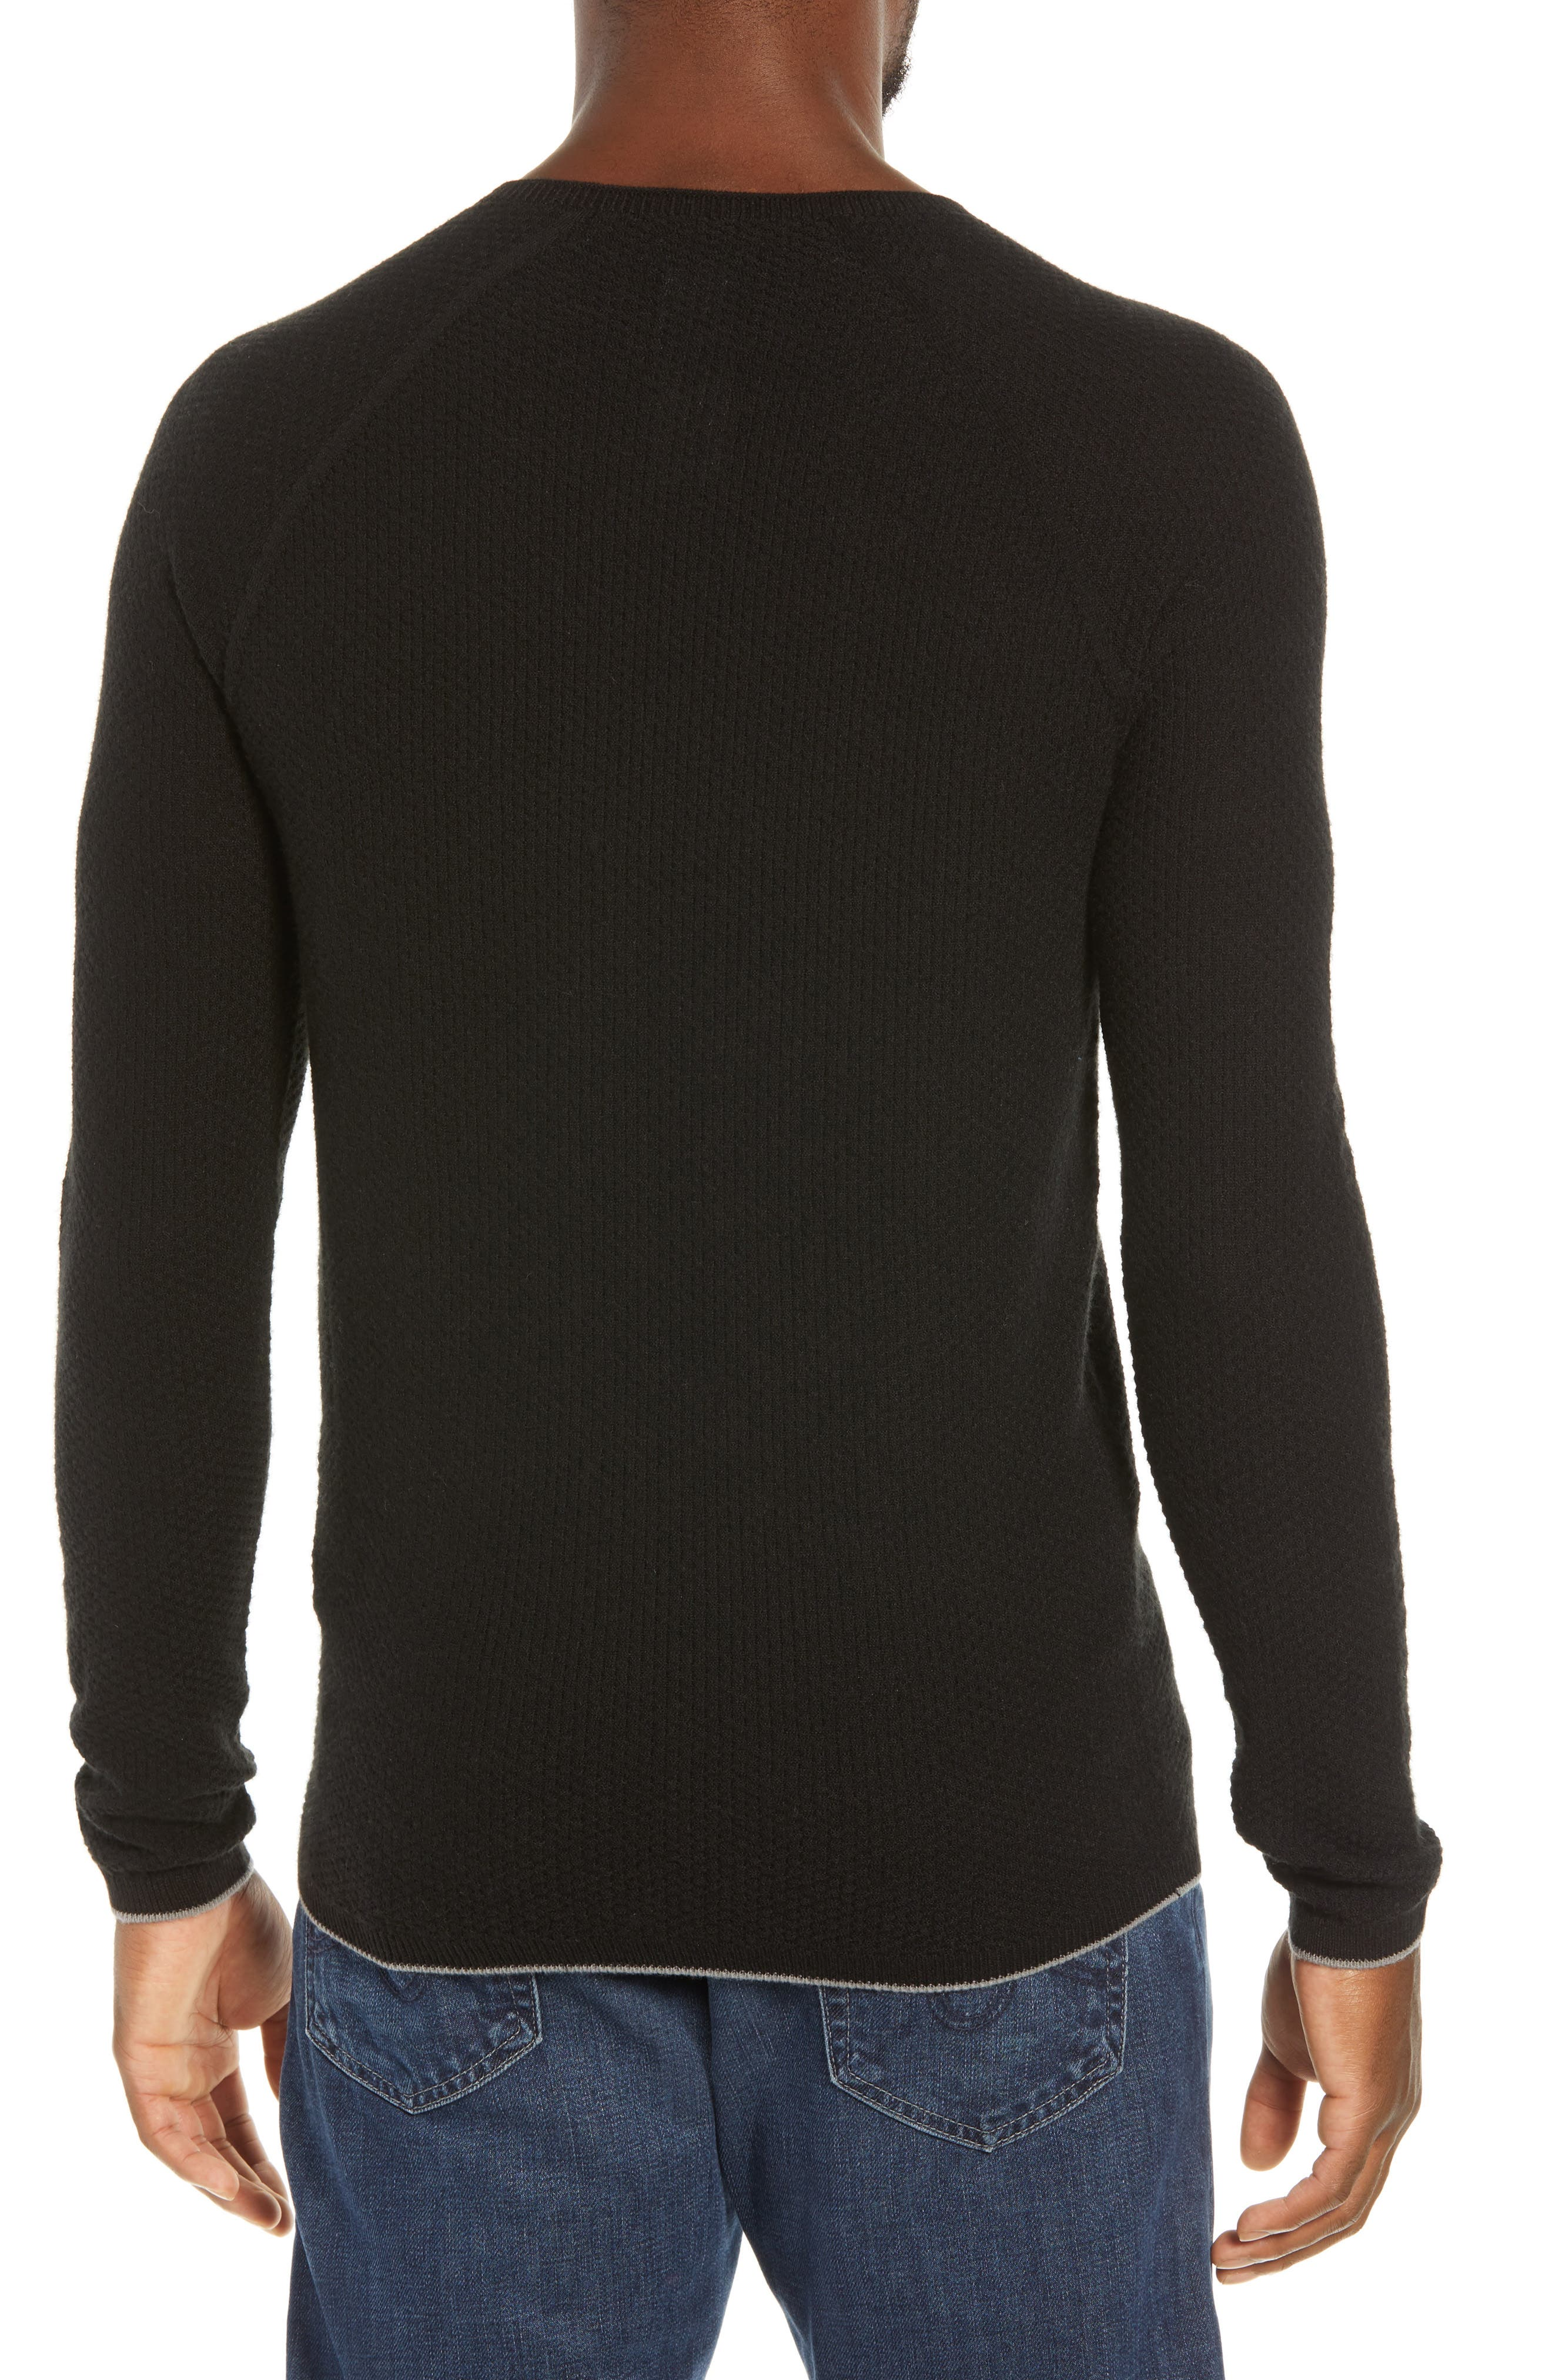 Capilene<sup>®</sup> Lightweight Air Crew Sweater,                             Alternate thumbnail 2, color,                             BLACK